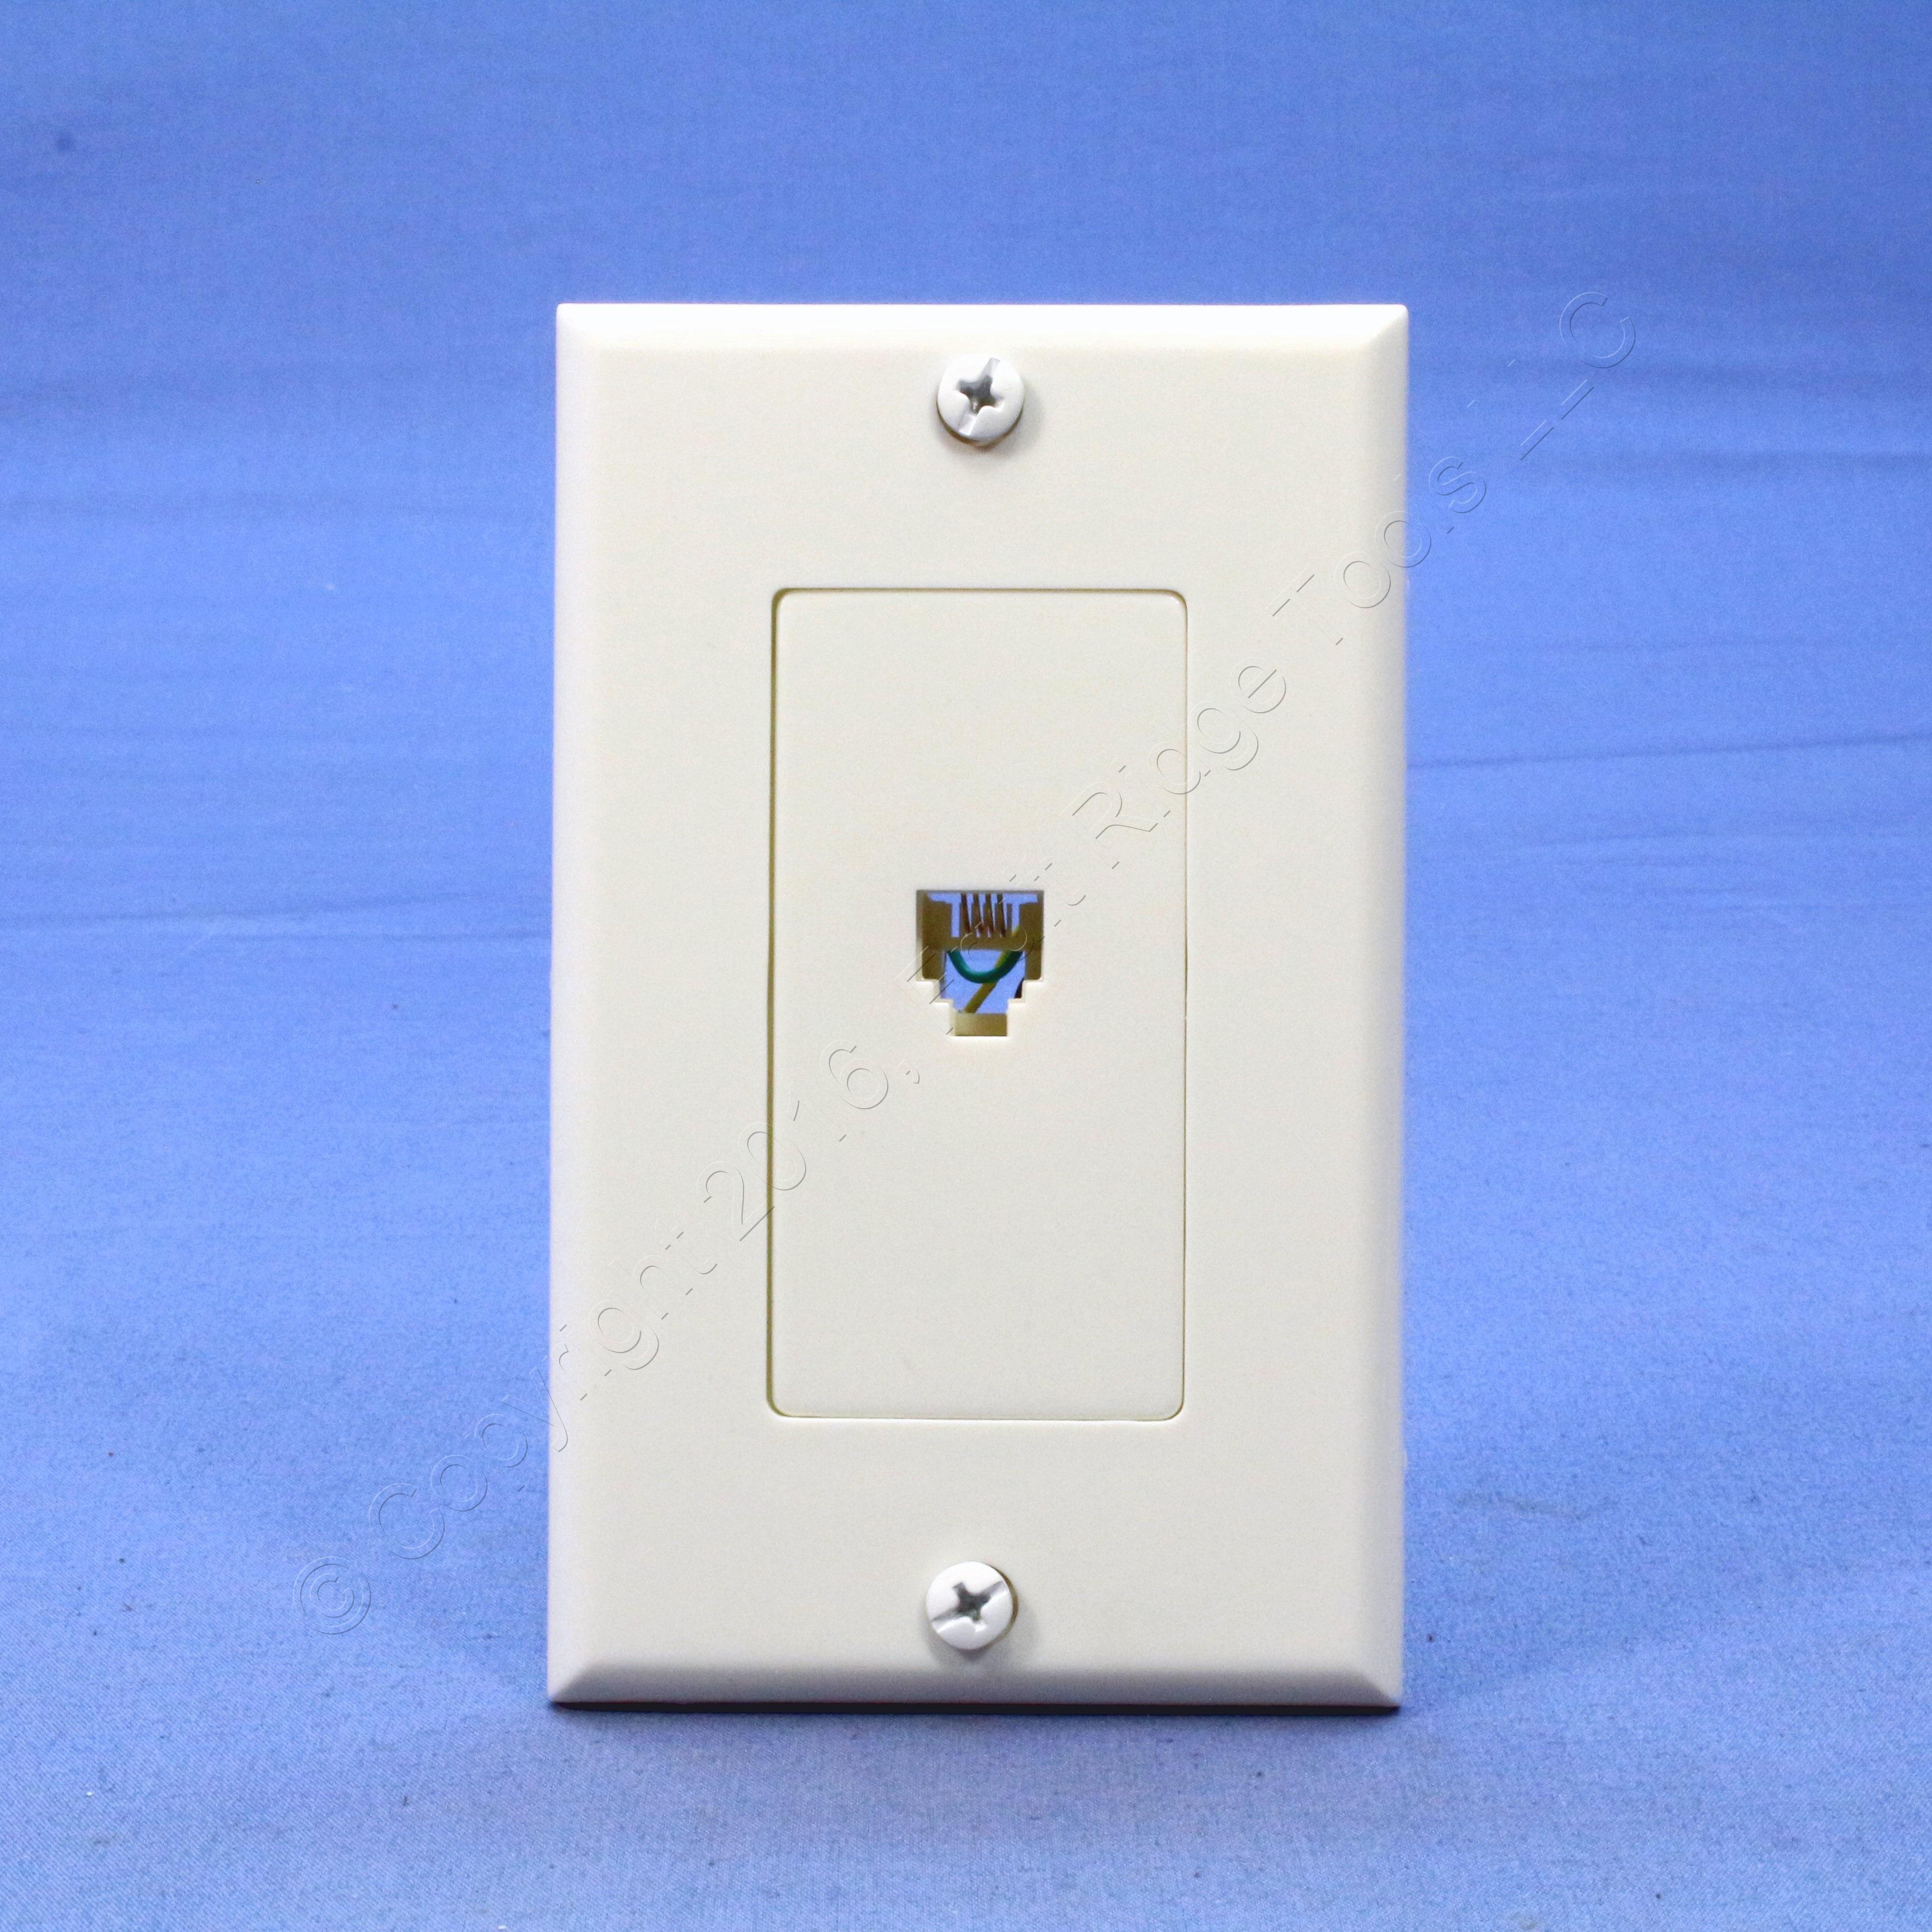 Leviton White Decora Phone Jack Wall Plate Telephone C2449-W ...